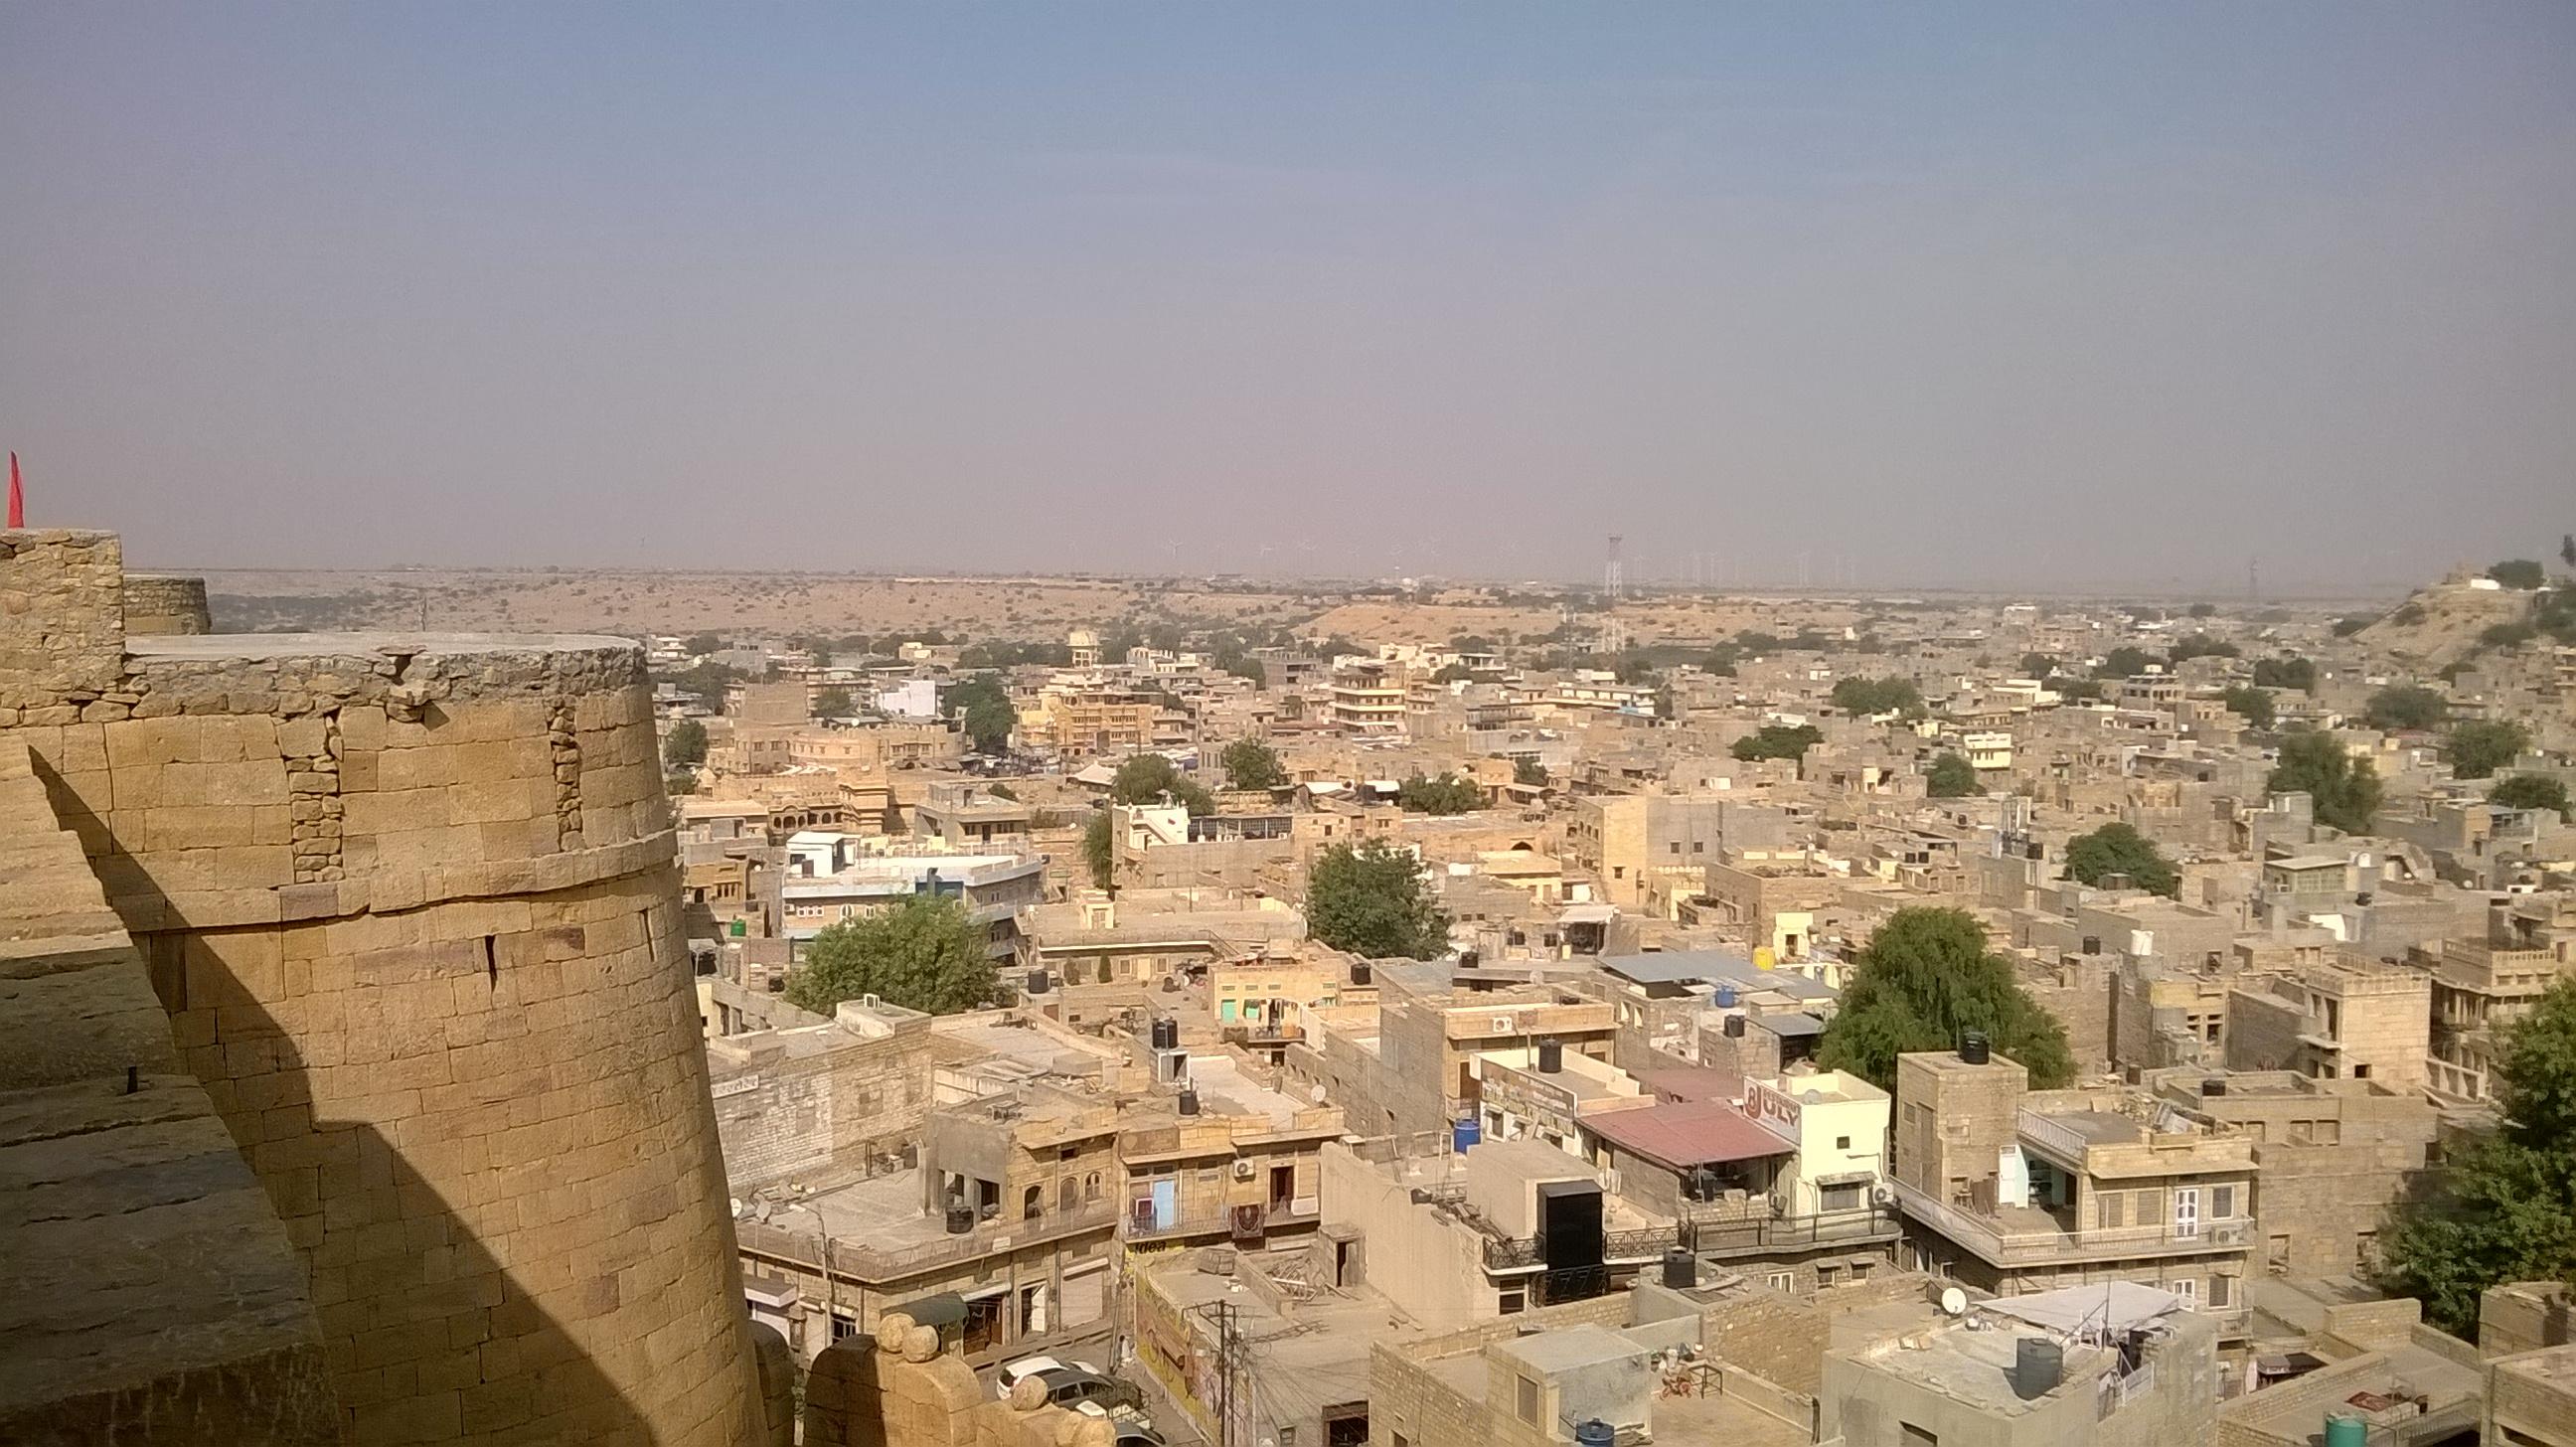 Rajasthan Hill Forts Jaisalmer